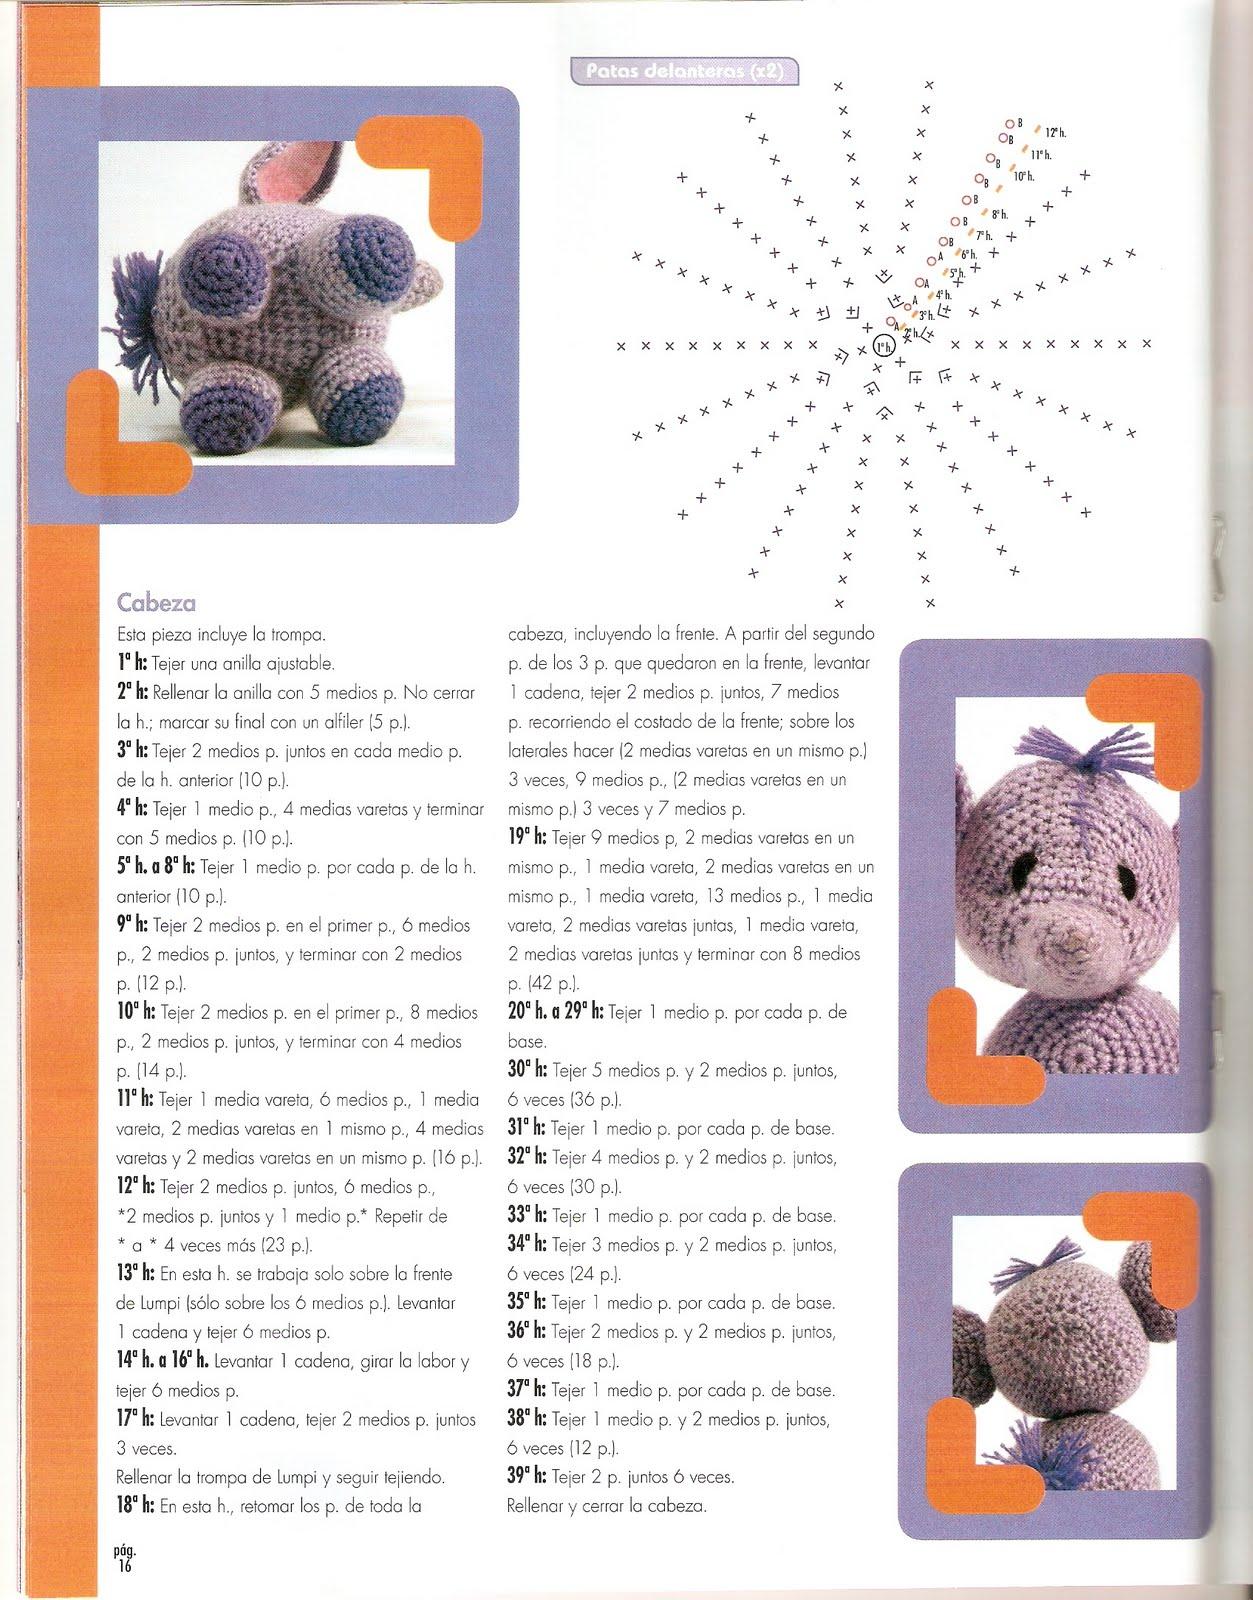 Elvie the Amigurumi Elephant - crochet PDF pattern by Airali design | 1600x1253